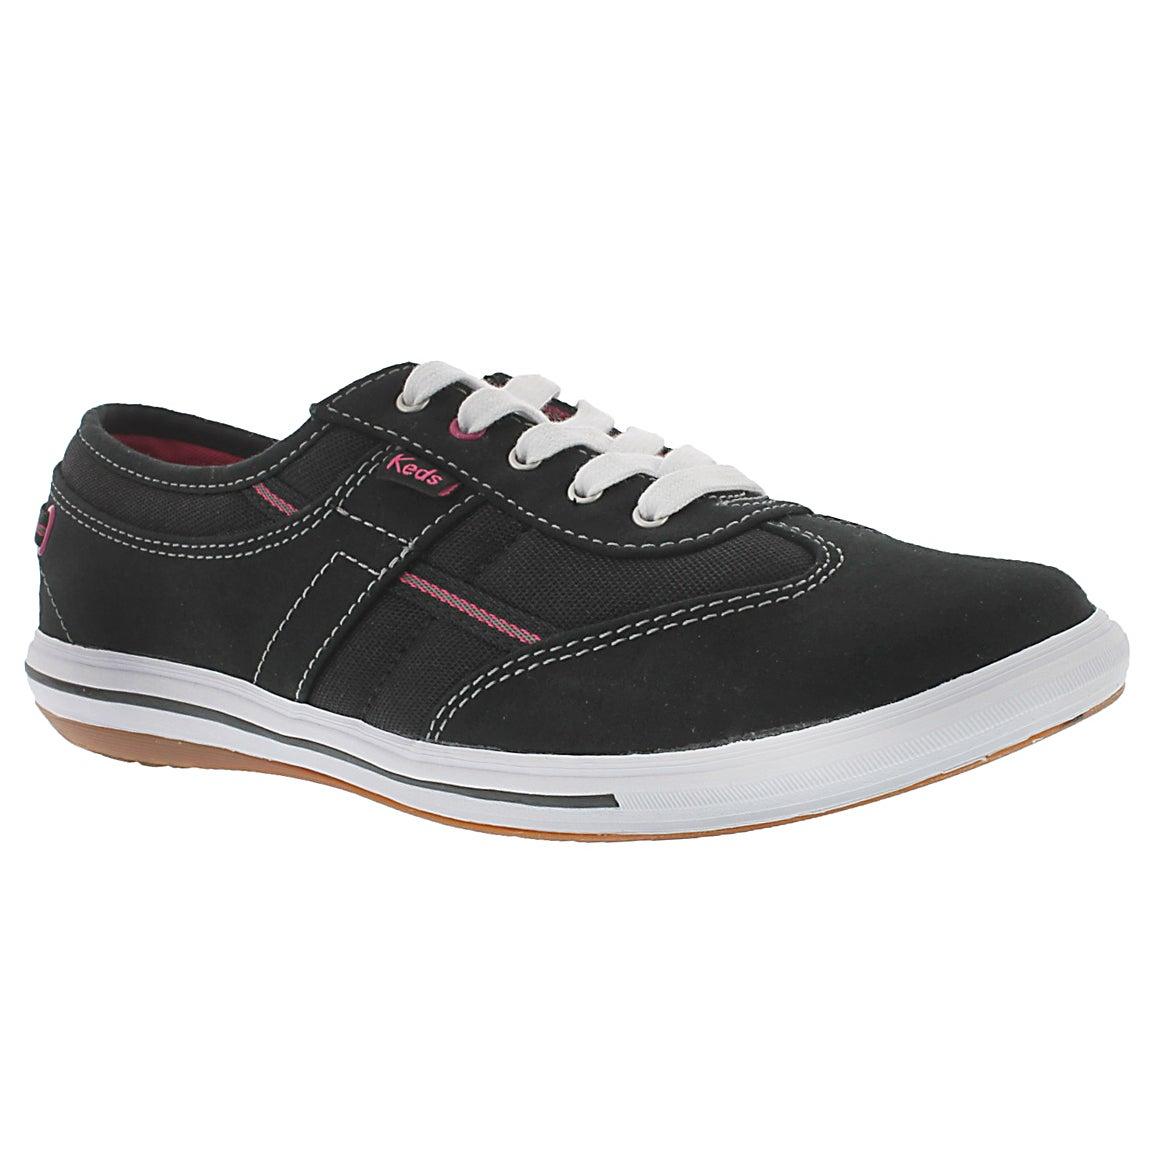 Women's CRAZE T-TOE black sneakers